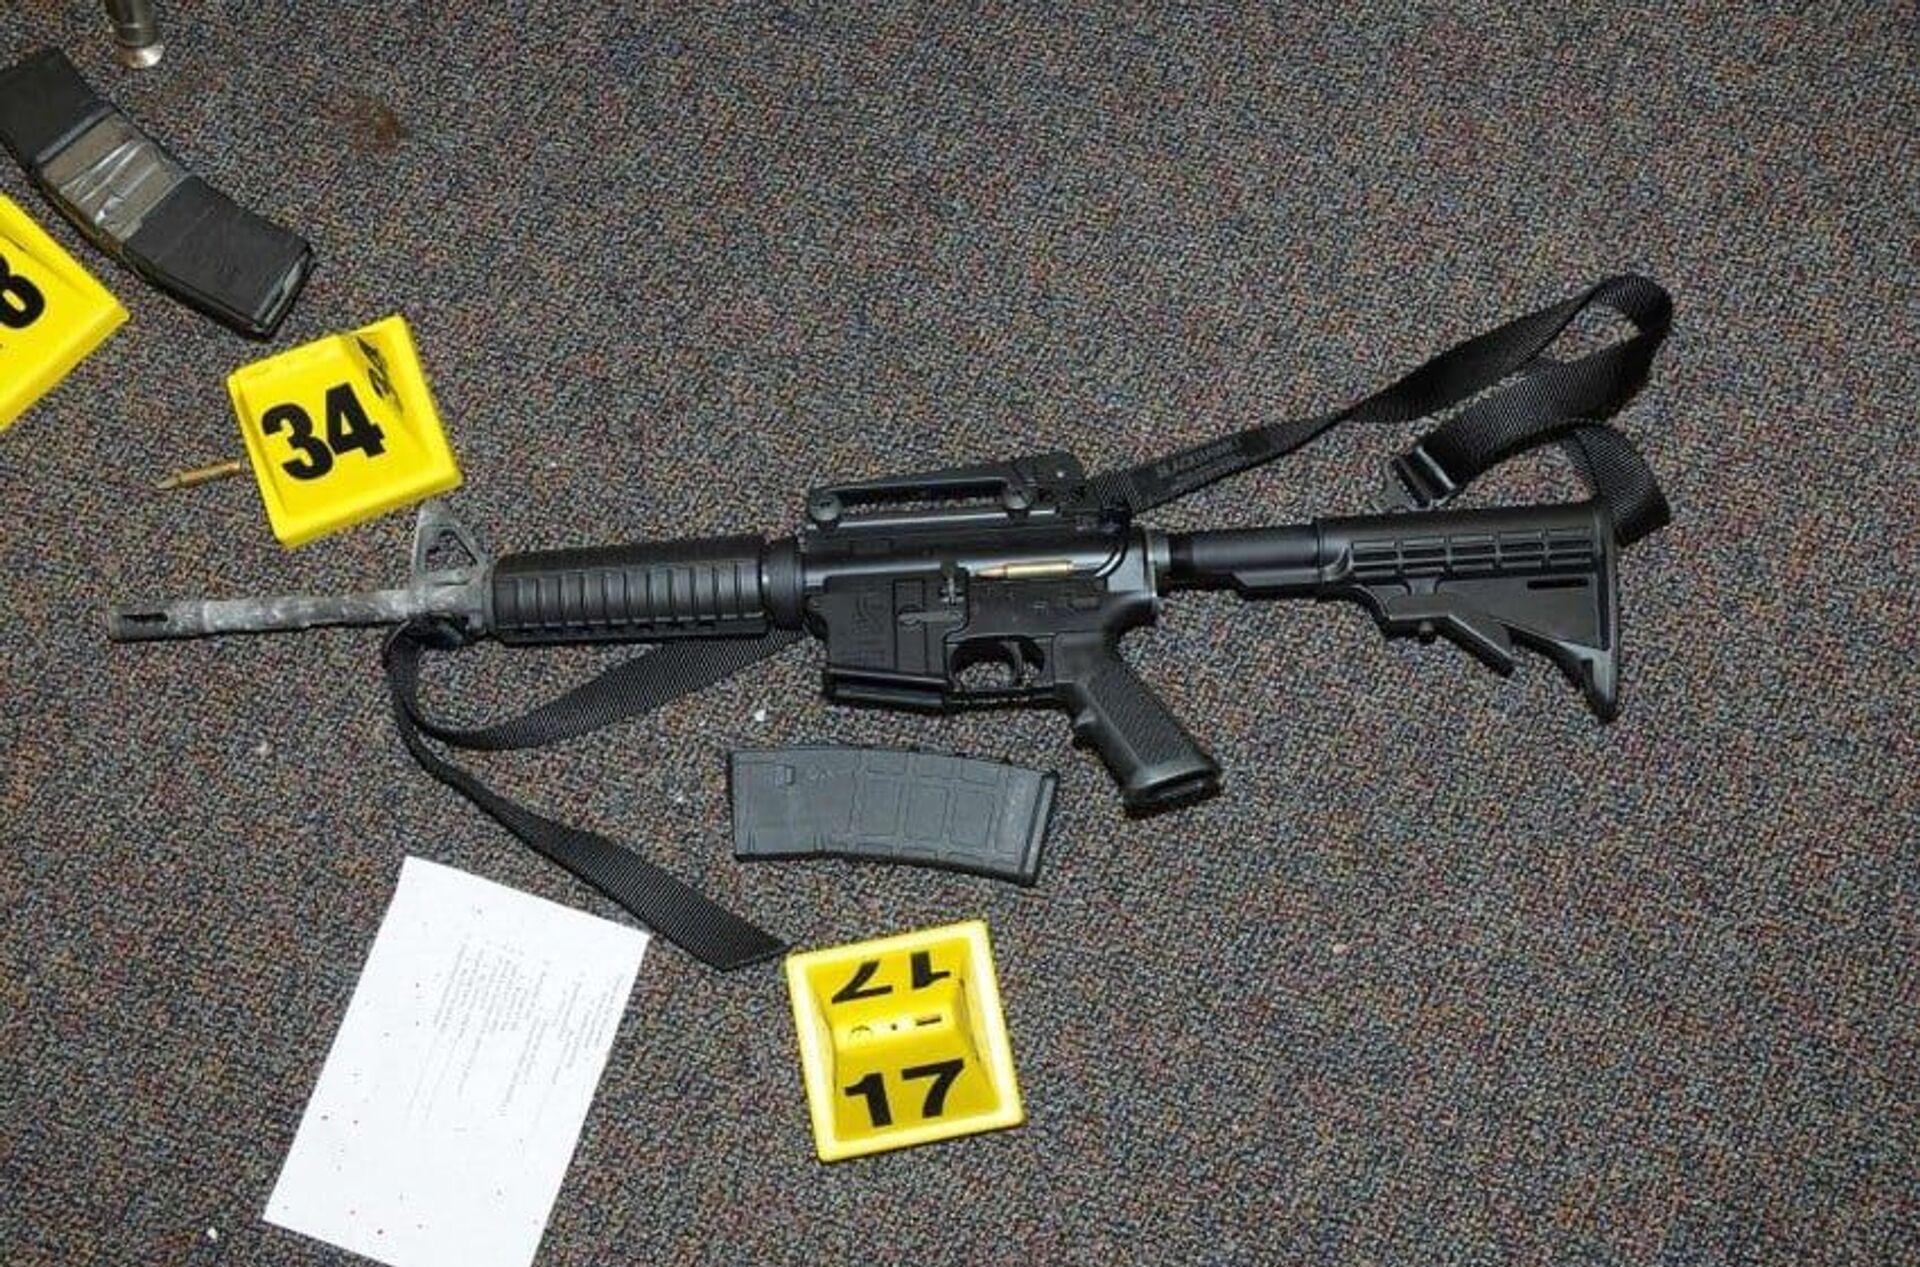 Remington Bushmaster XM15-E2S used in Sandy Hook shootings - Sputnik International, 1920, 07.09.2021